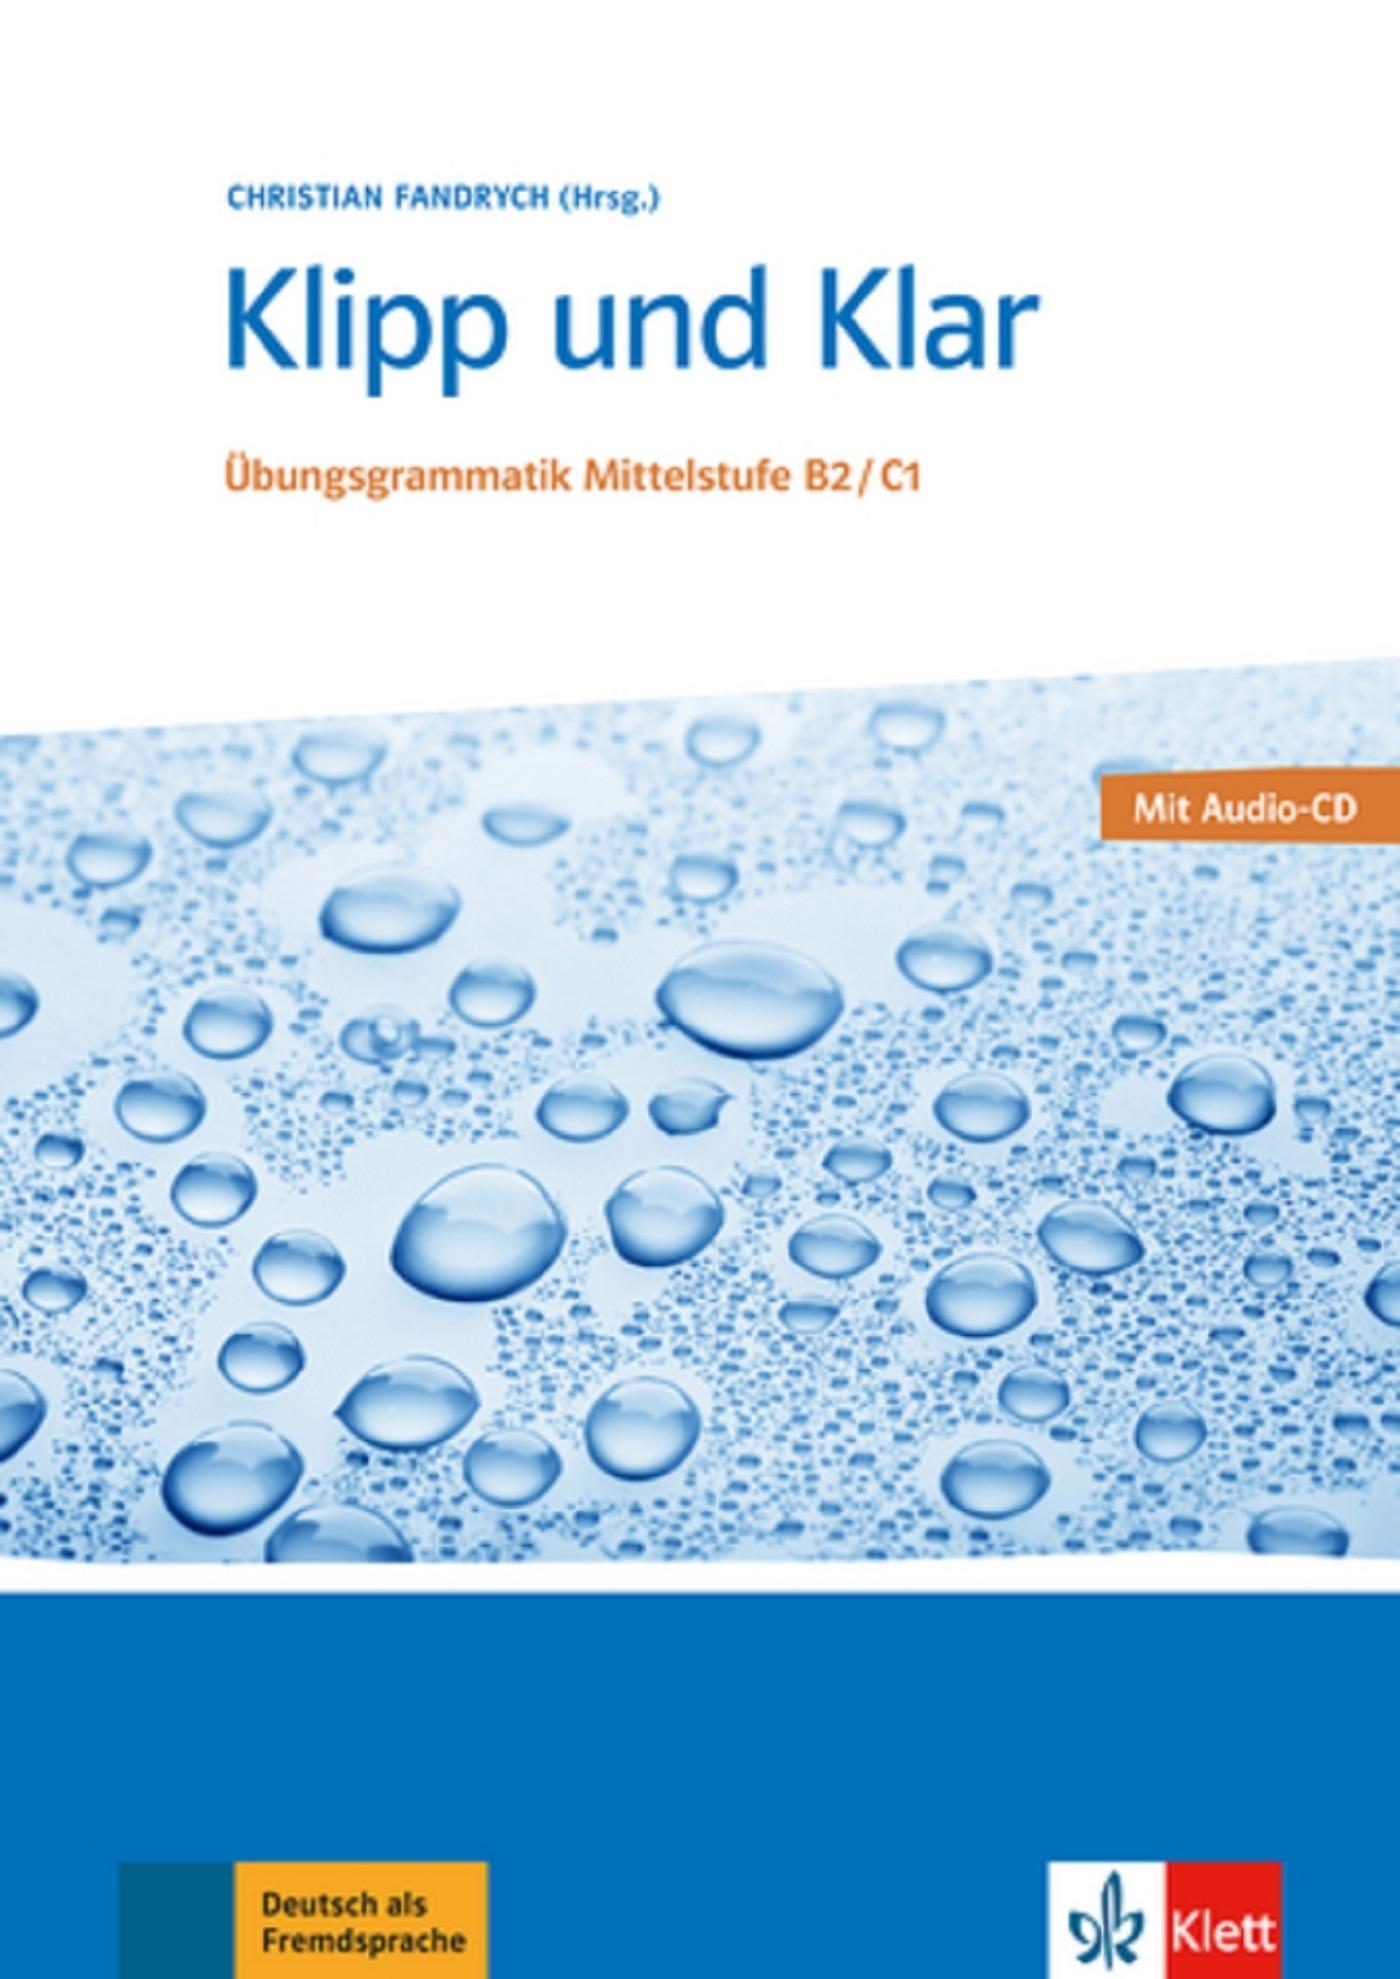 KLIPP UND KLAR B2 ET C1 - LIVRE